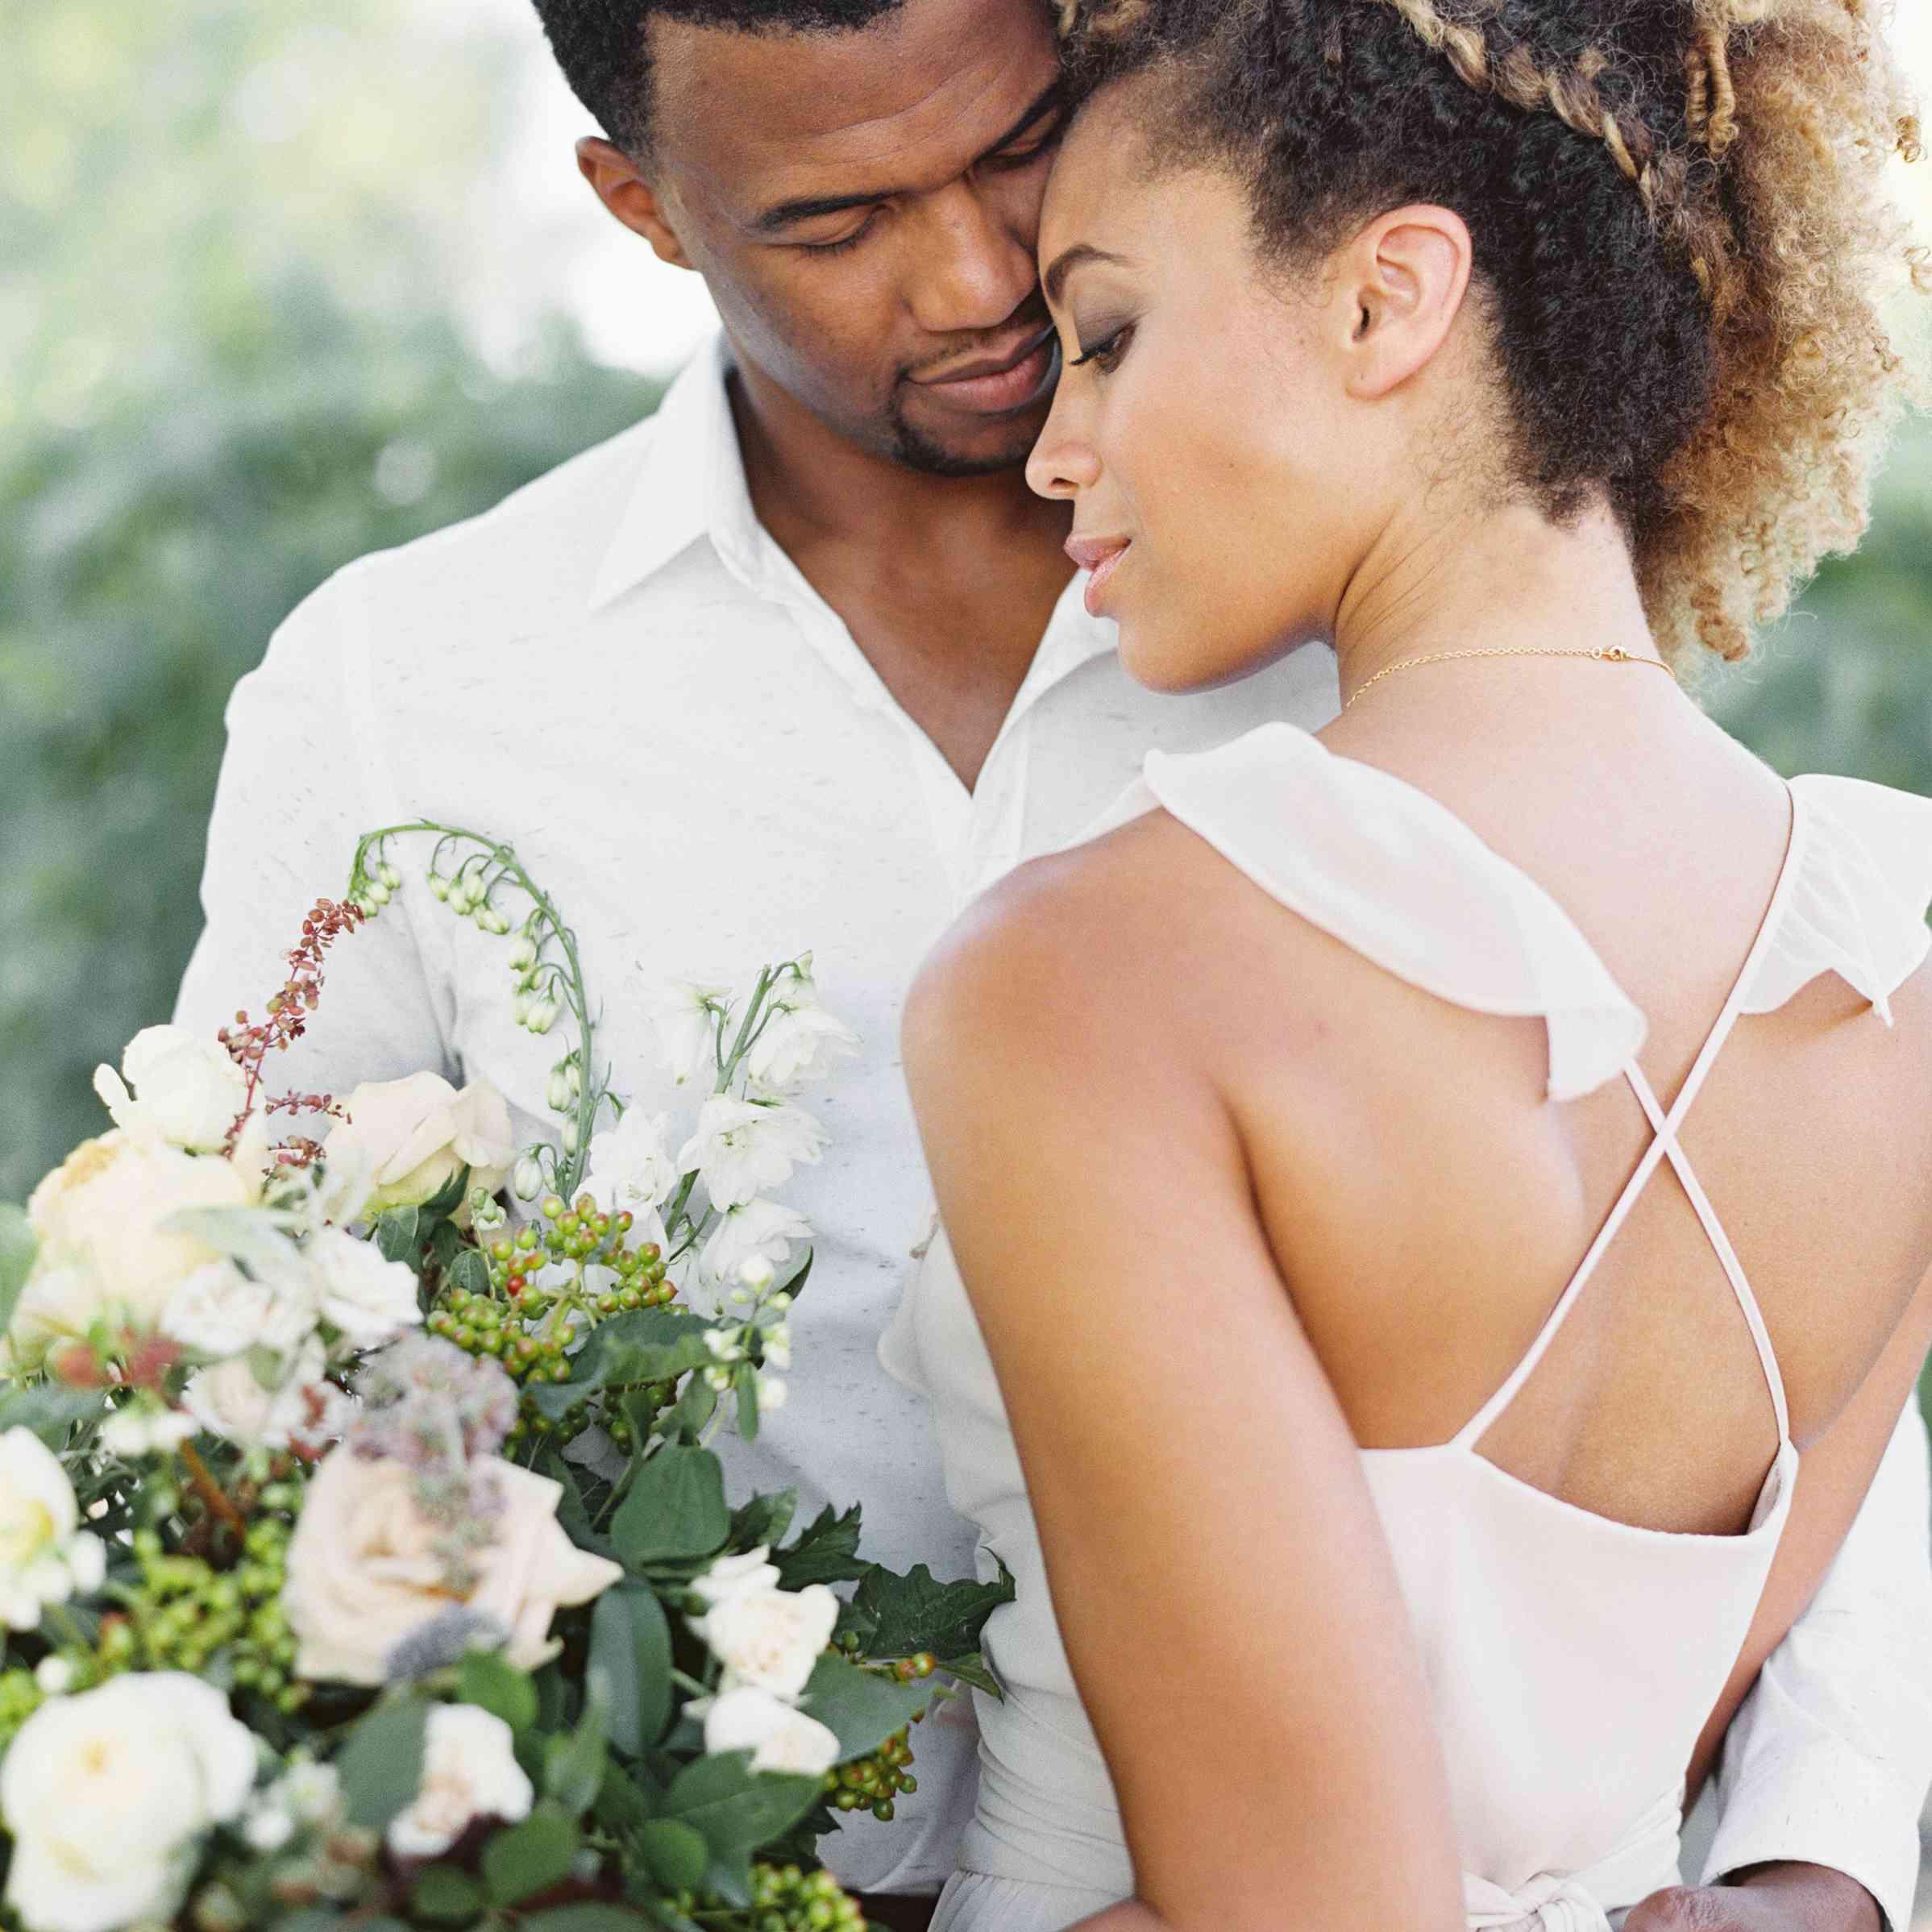 Braided updo natural hair wedding couple